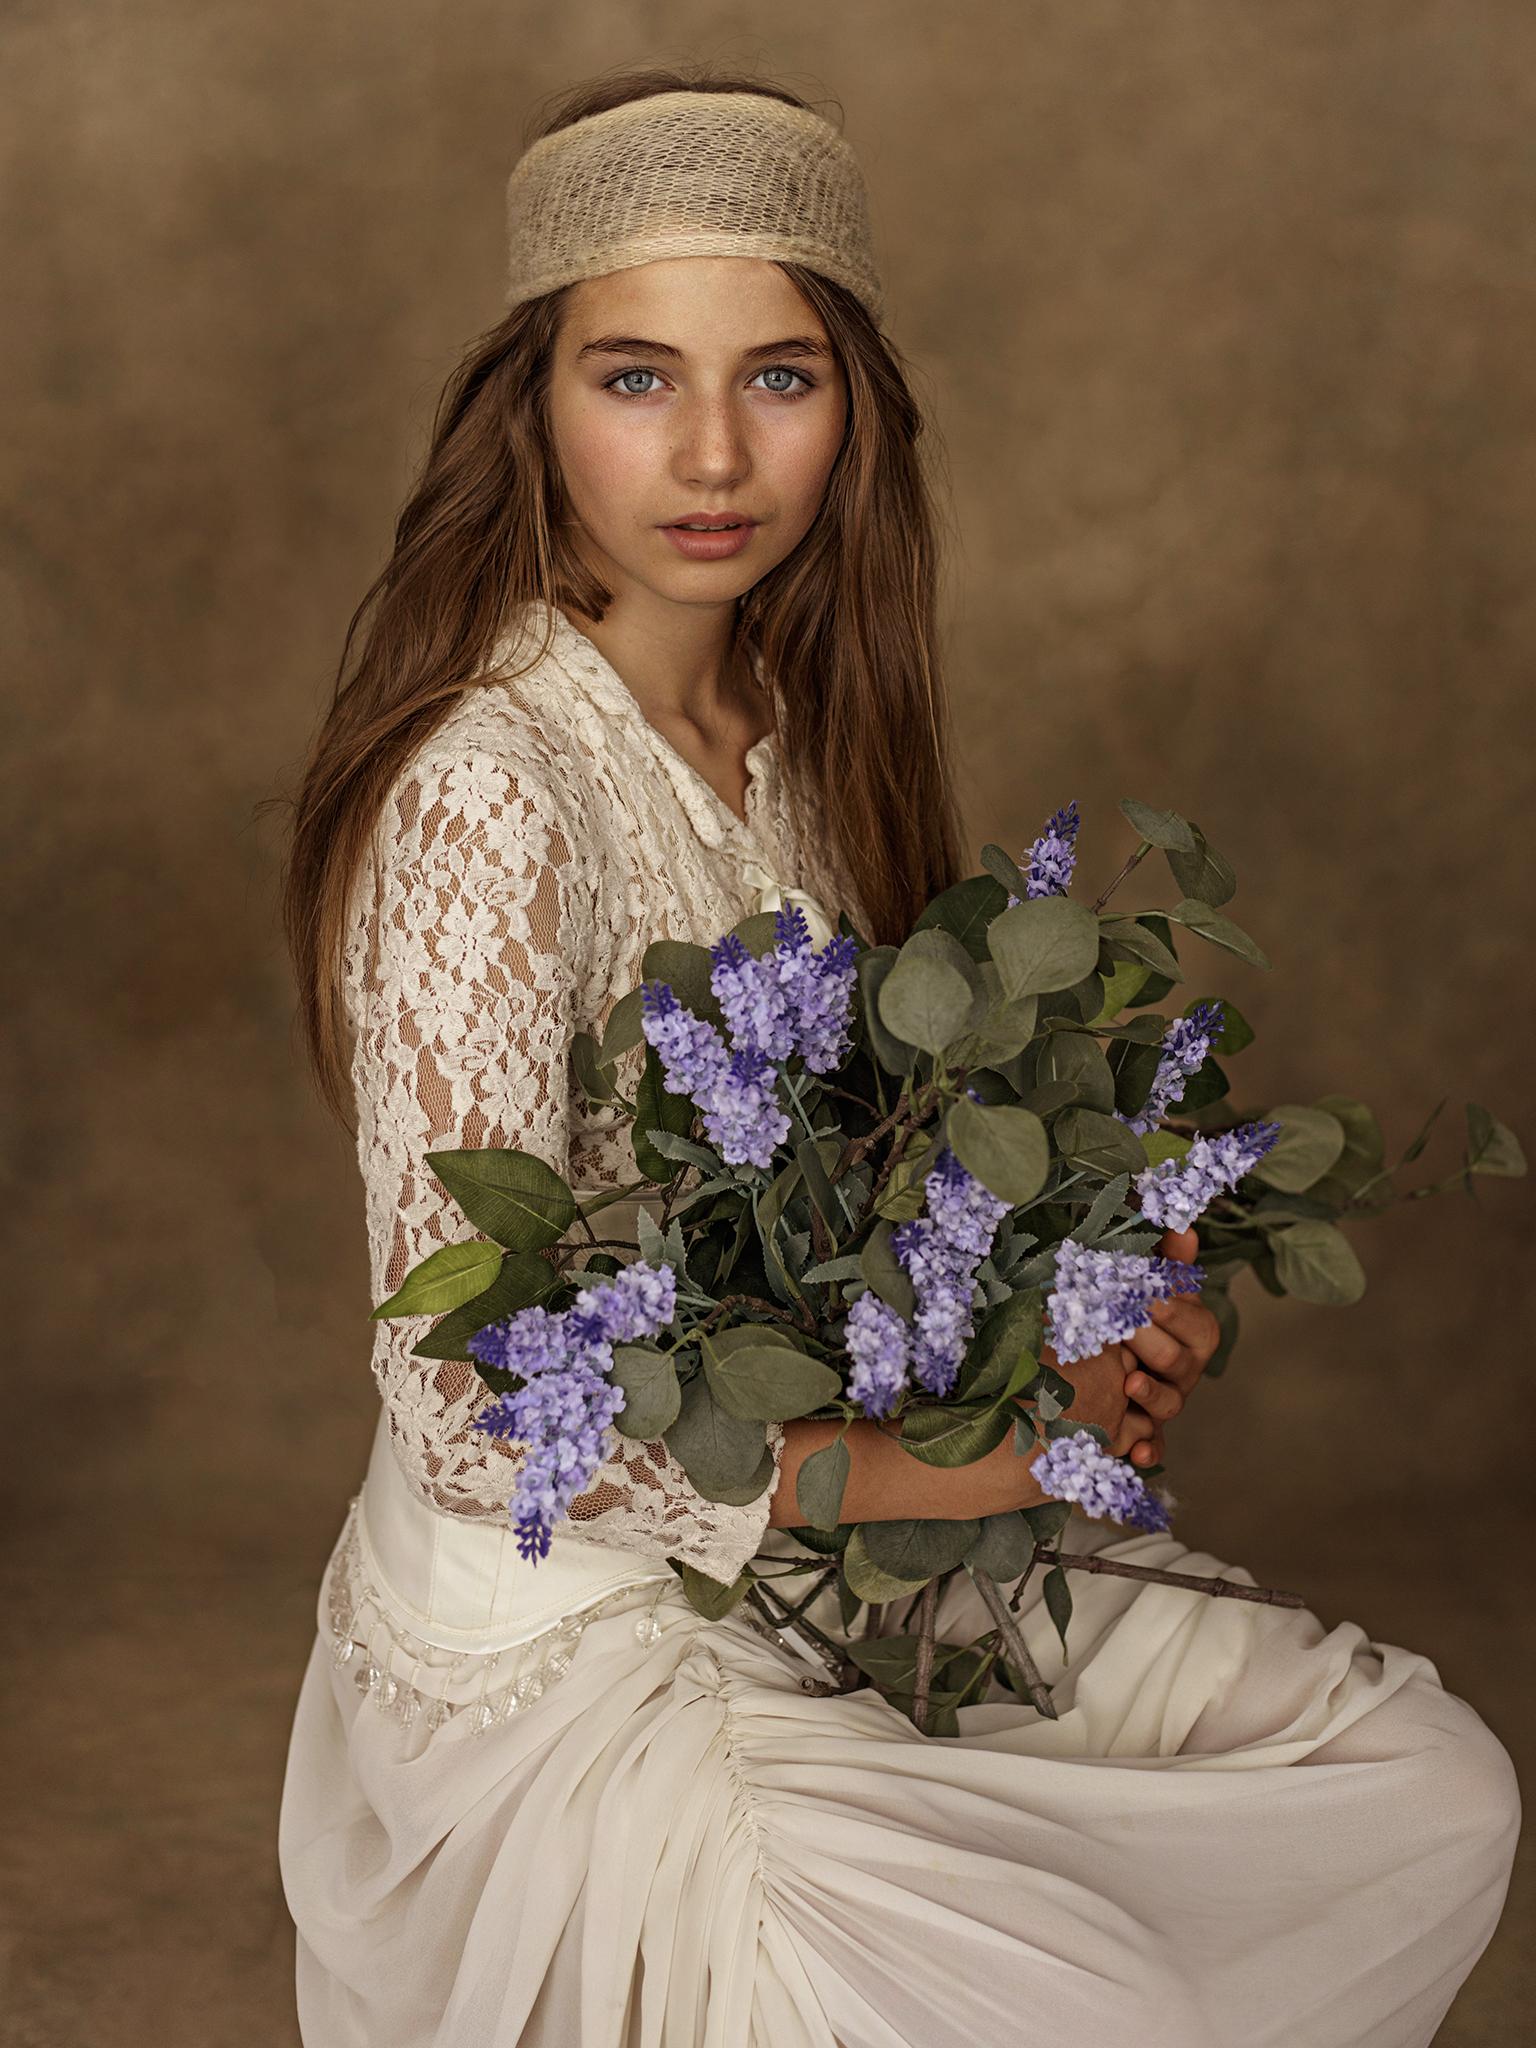 Michael Stief Childrens Photography 8.jpg